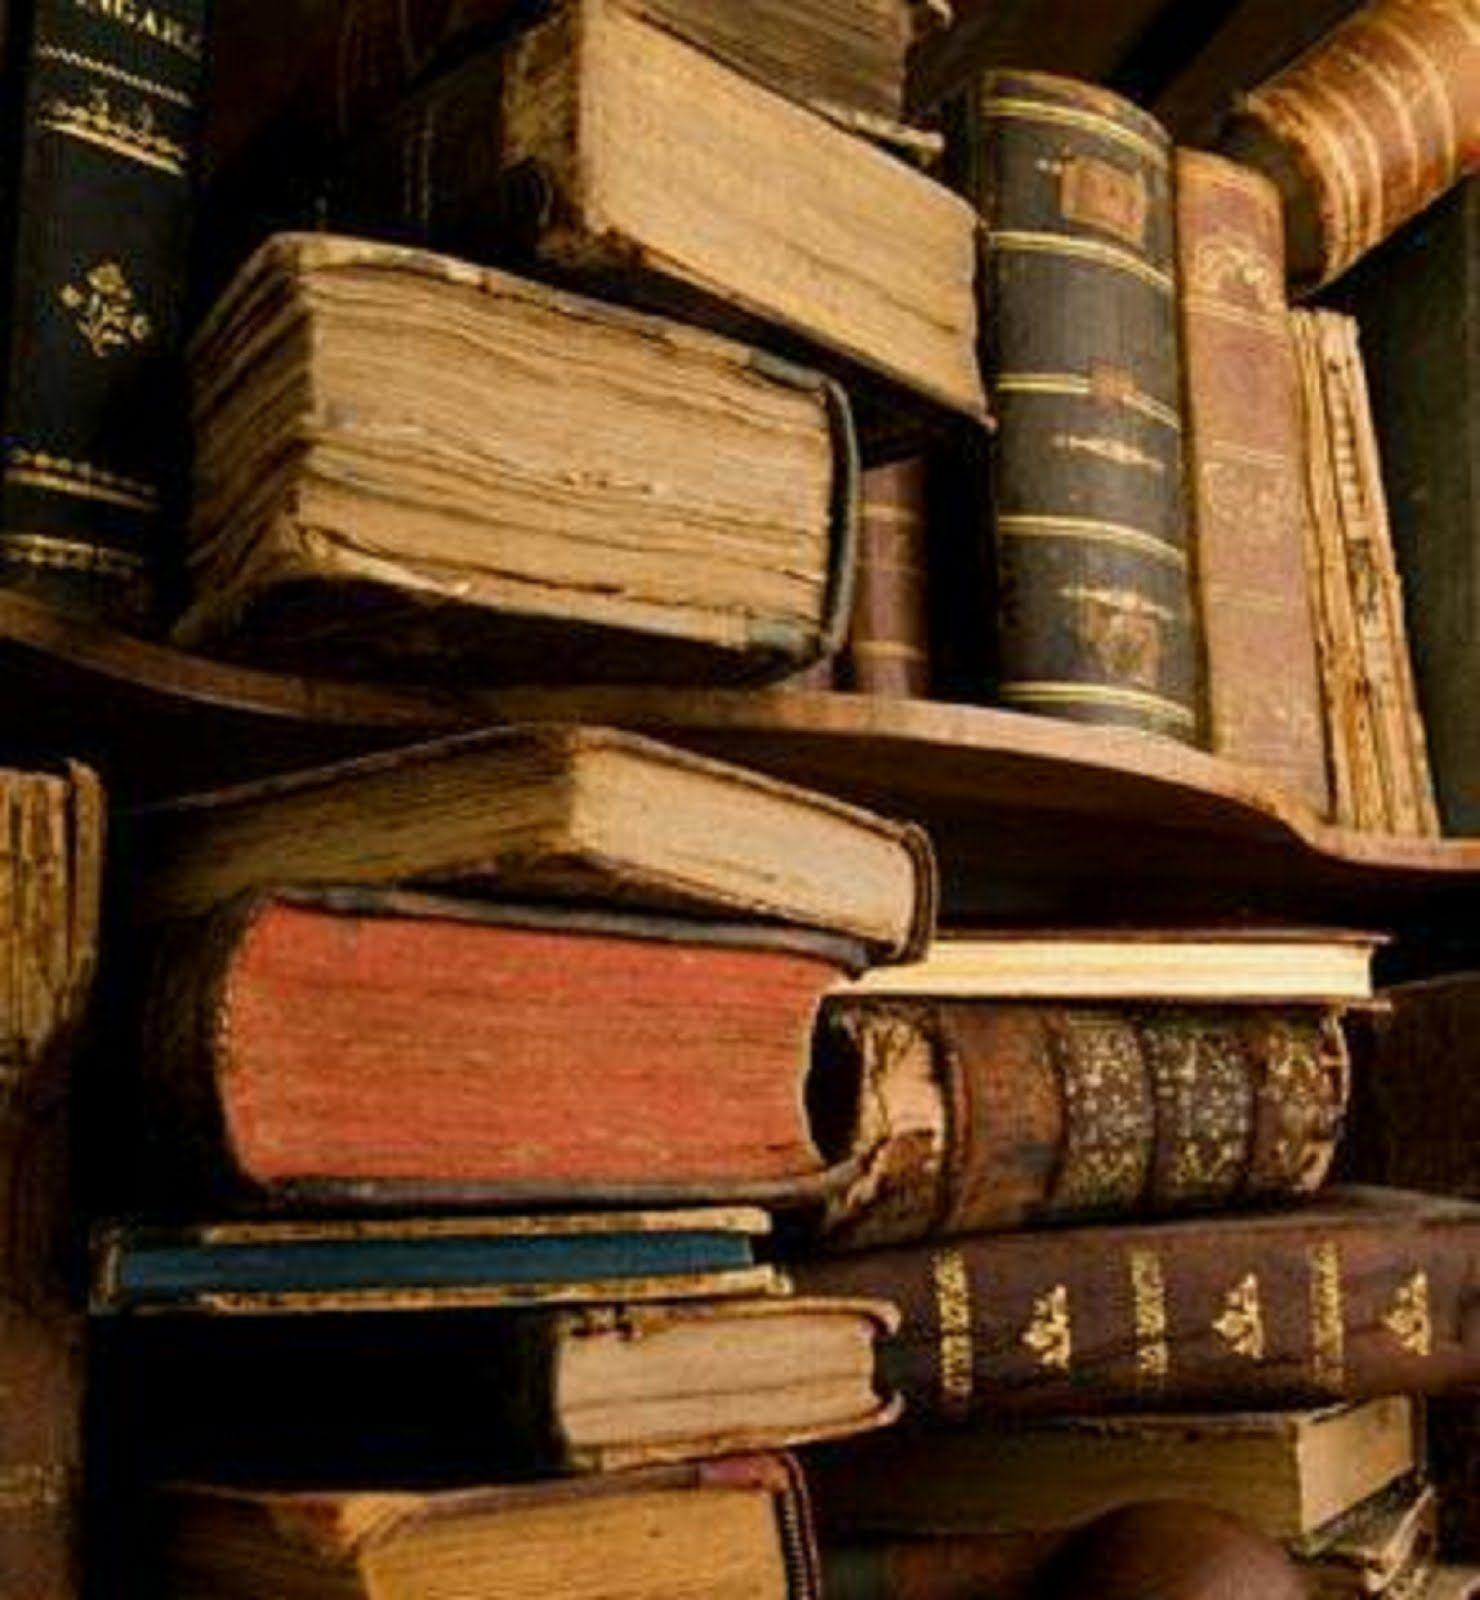 antique bookshelf old books 3d model |Old Bookshelf With Books